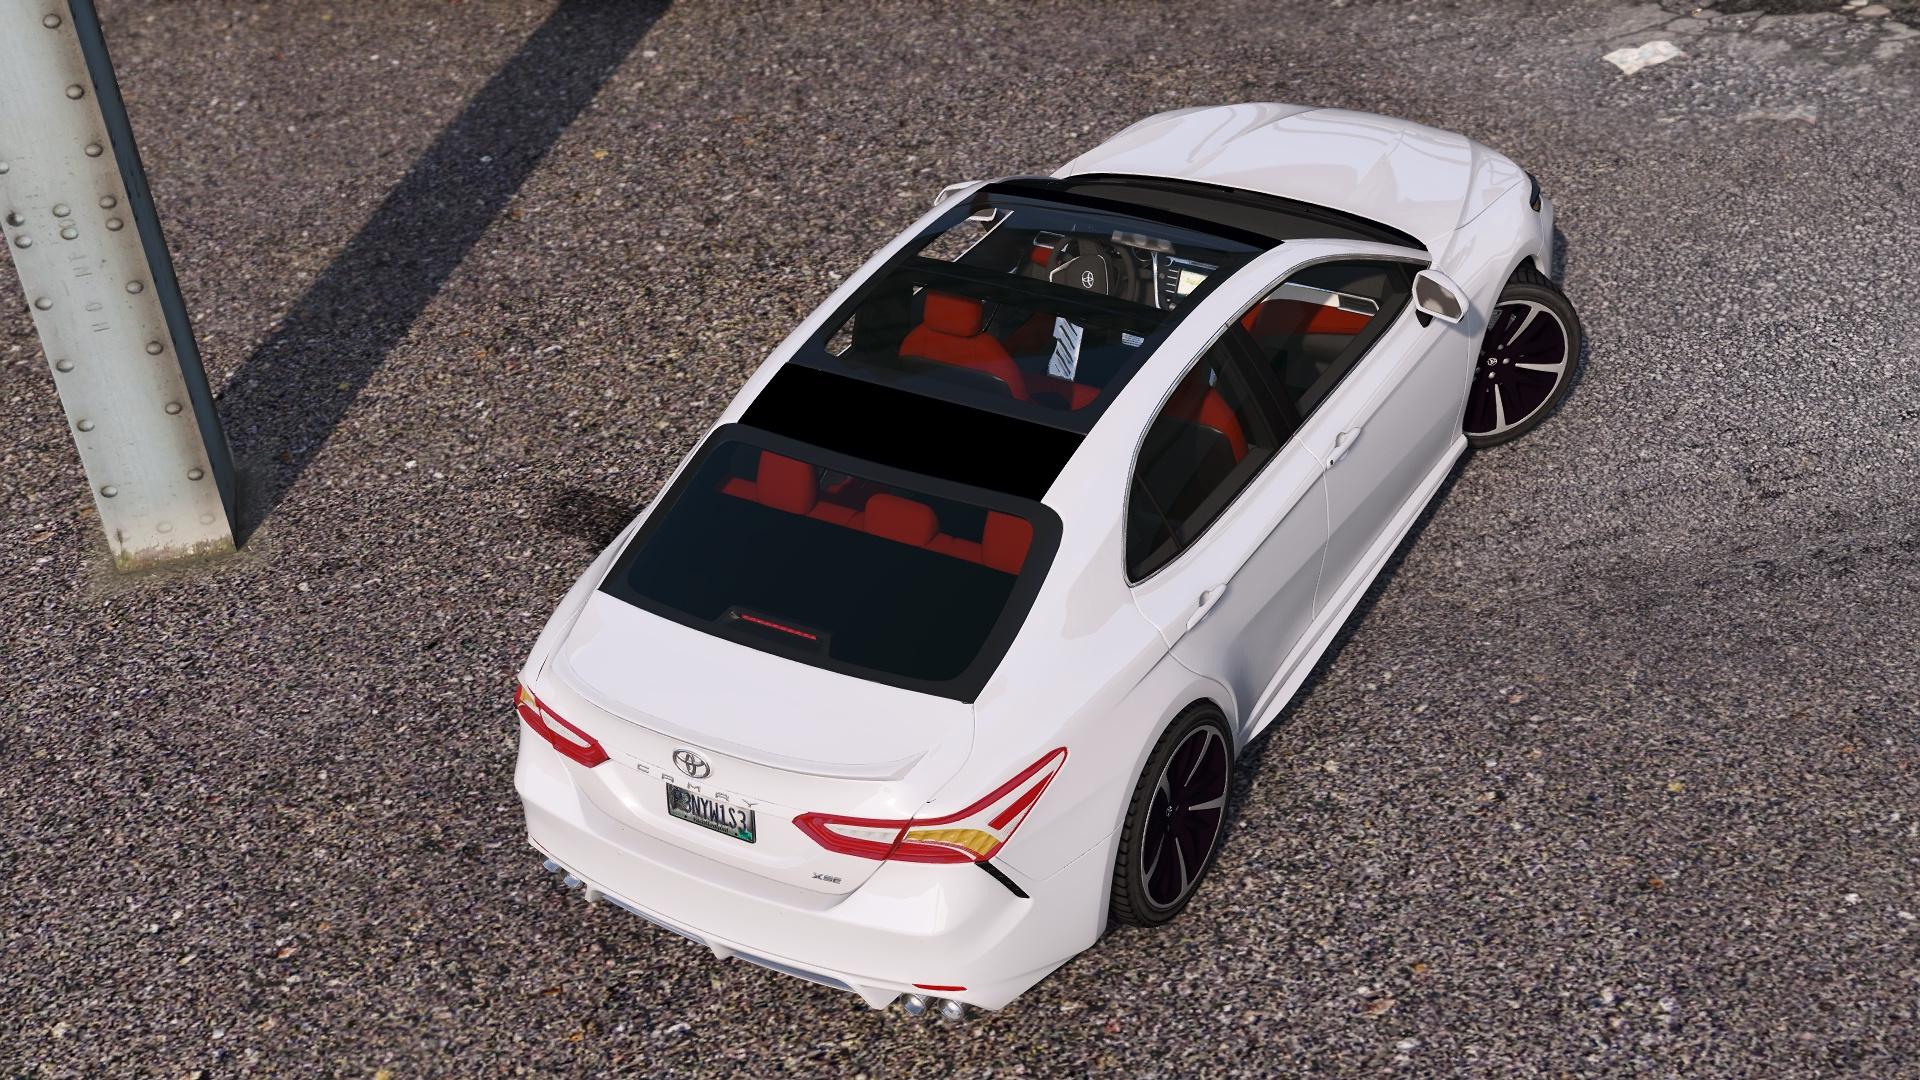 Xse 2018 Camry >> 2018 Toyota Camry XSE - GTA5-Mods.com